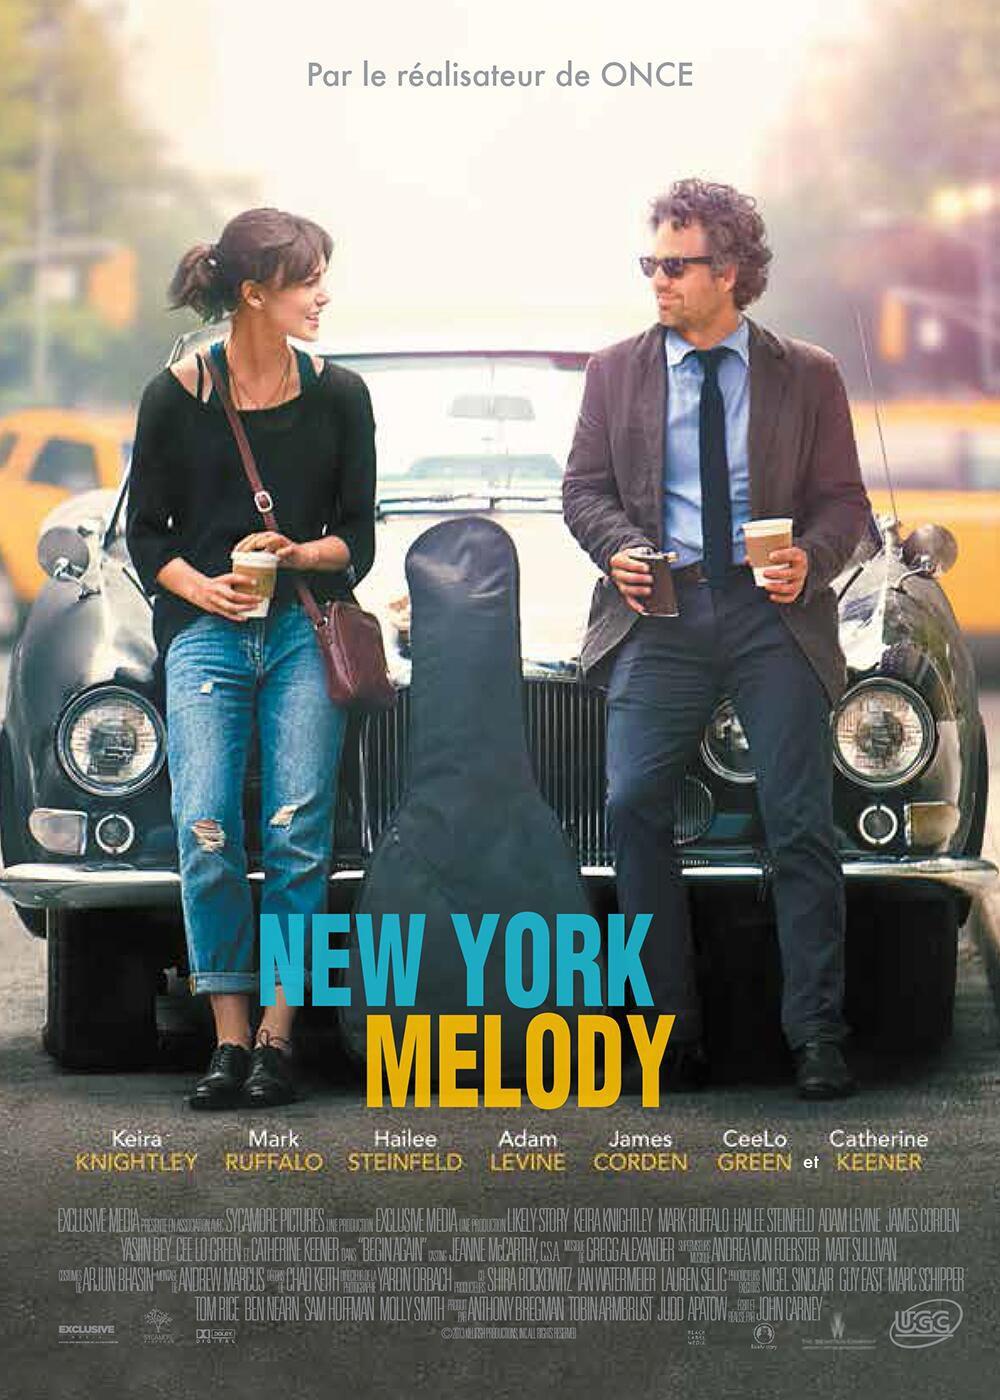 New York Melody - Film (2014)